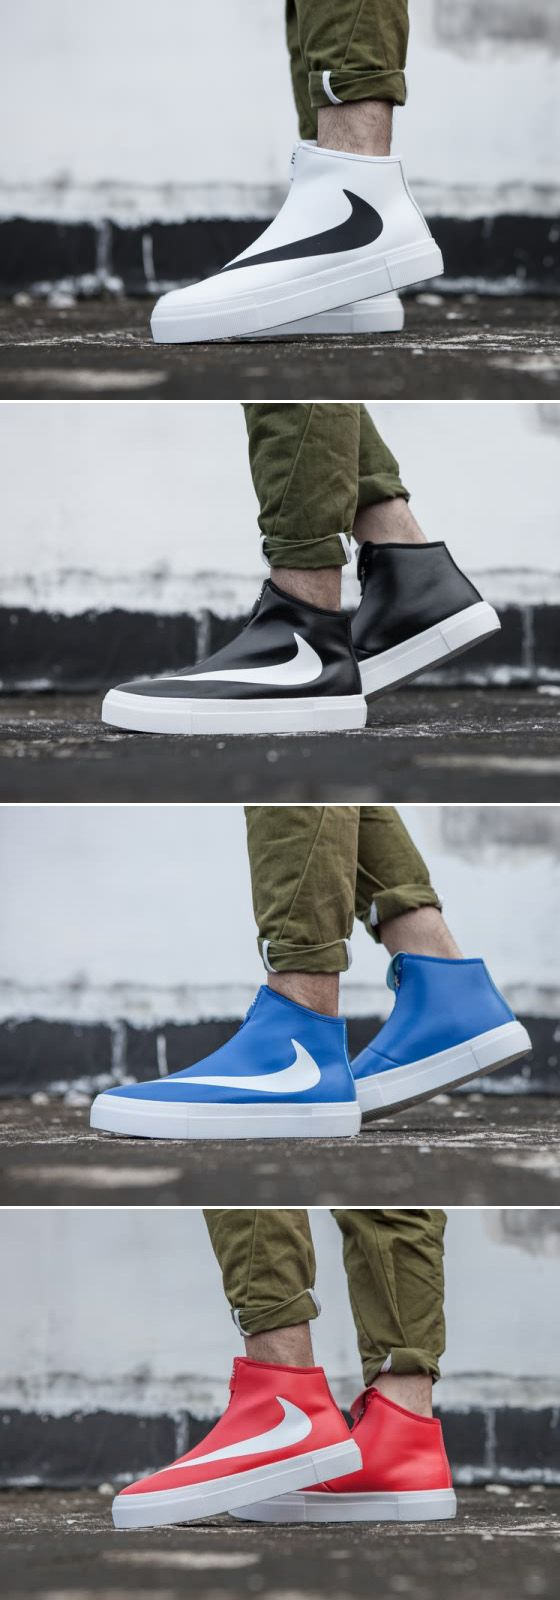 new style 2b12a 3b804 Nike Blazer HI Big Swoosh Unisex Free Shipping | Nike blazer ...